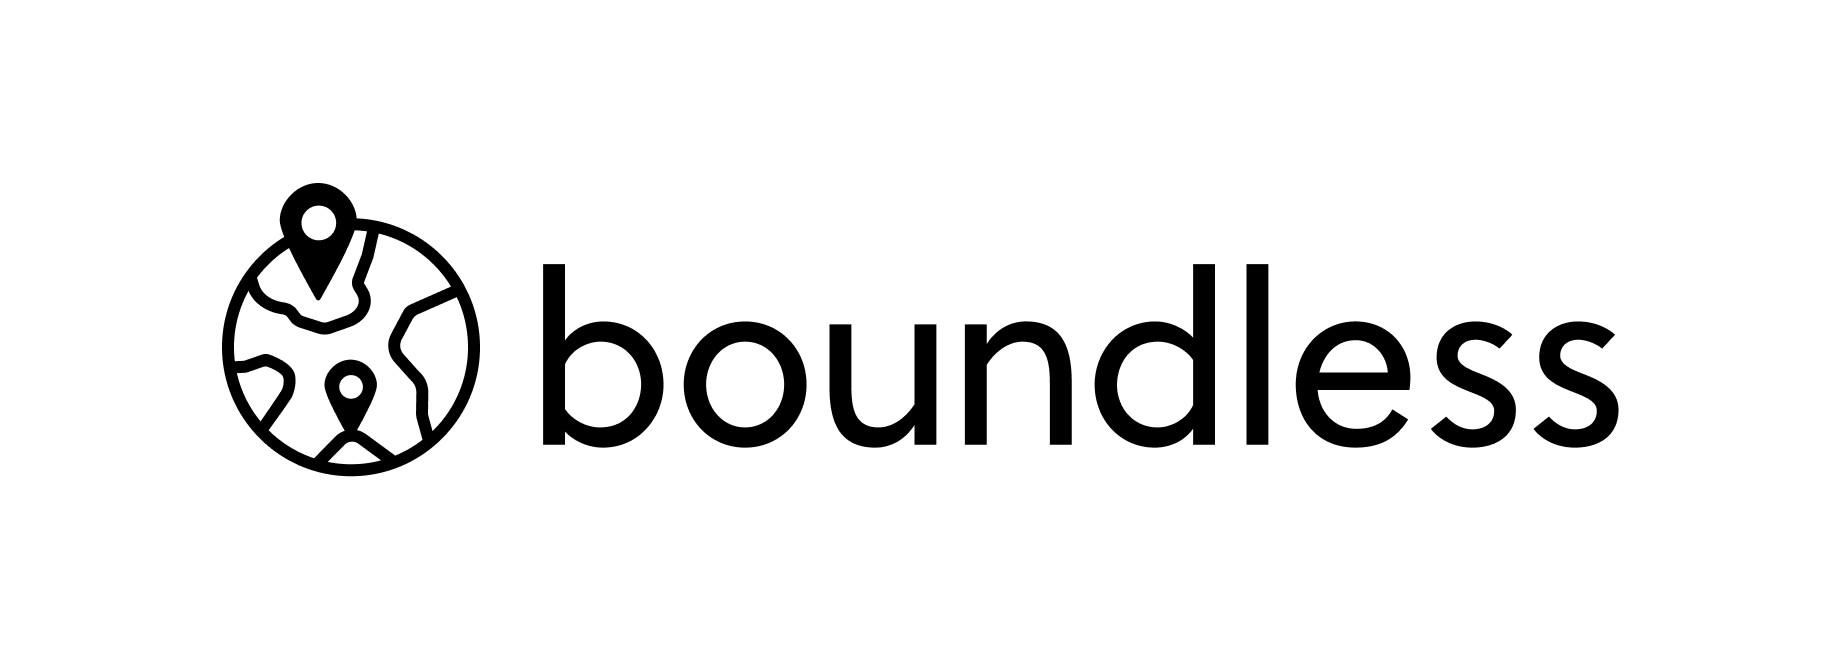 Boundless | LinkedIn